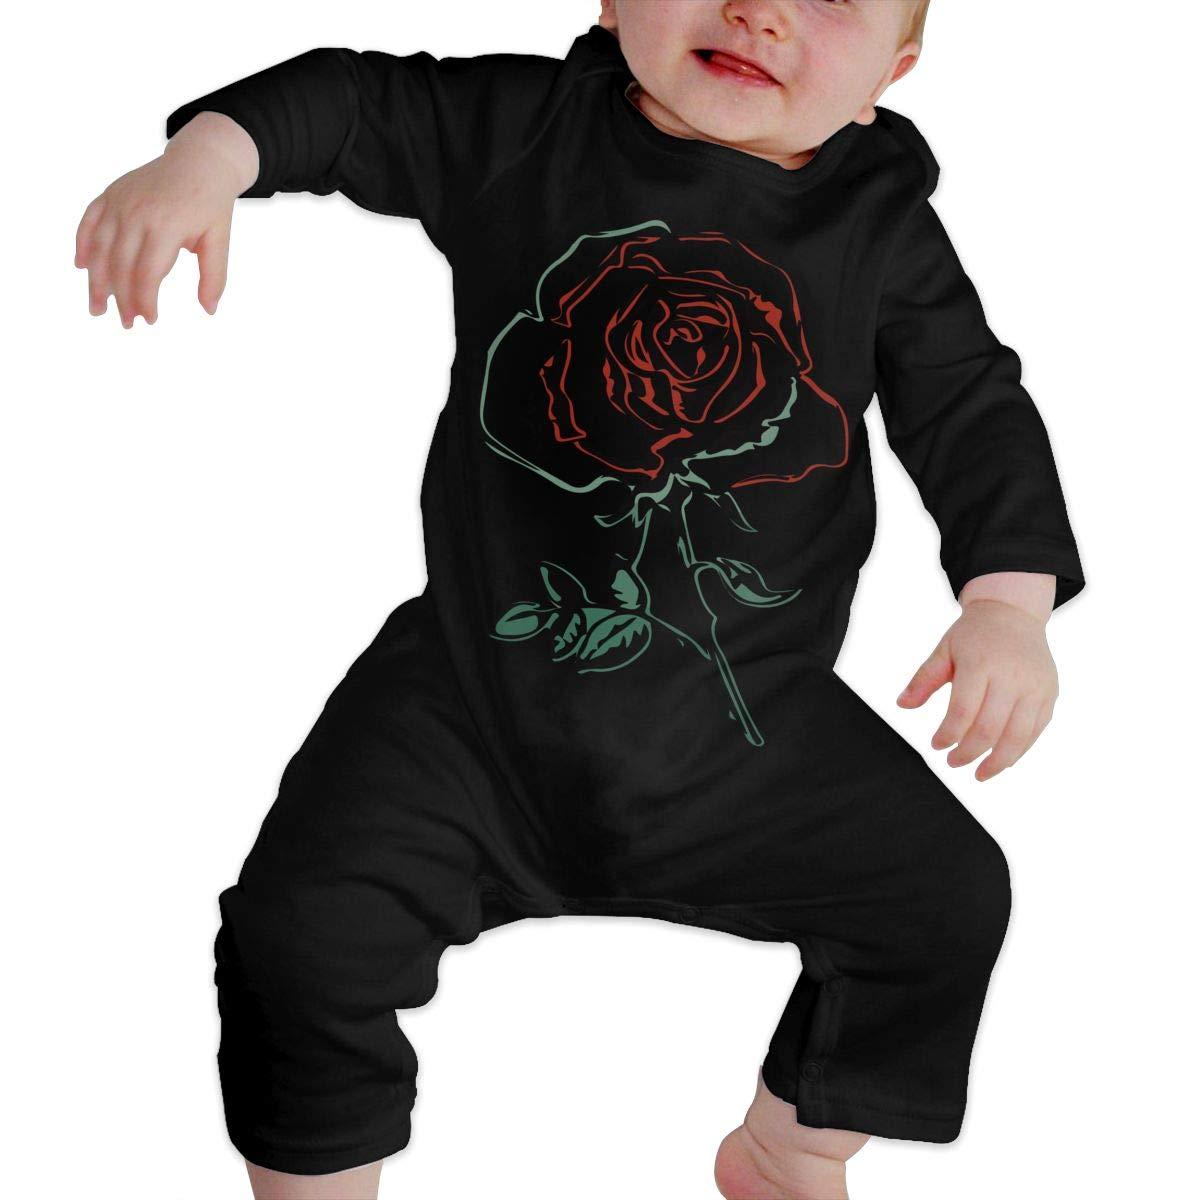 UGFGF-S3 Rose Red Toddler Baby Long Sleeve Romper Jumpsuit Kid Pajamas